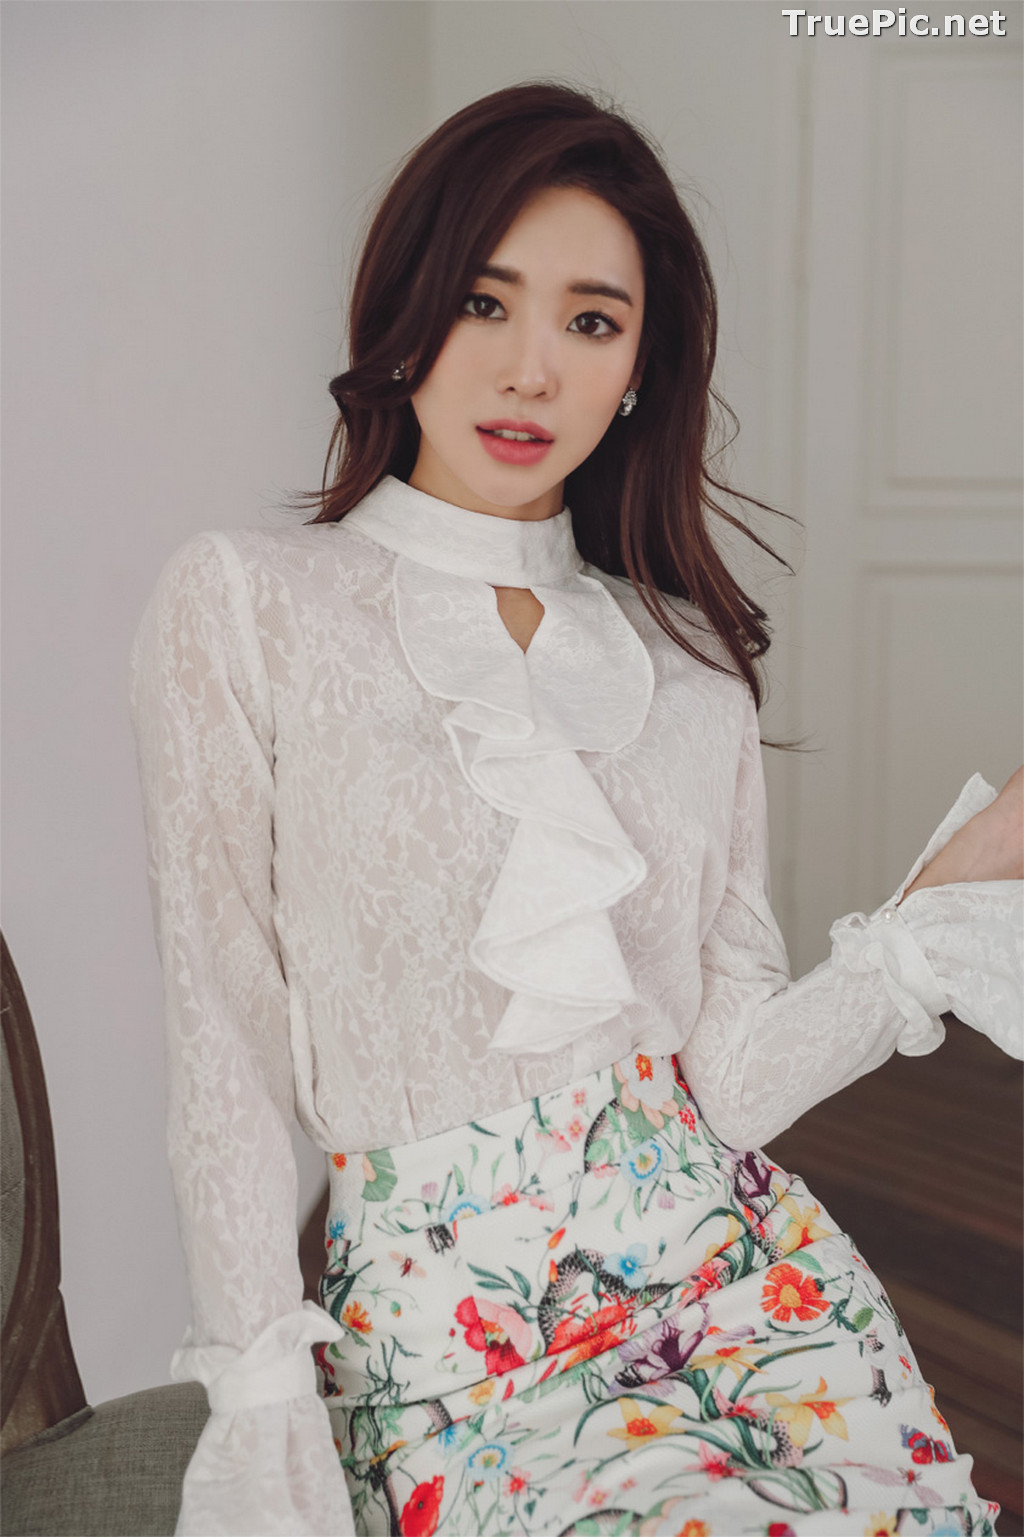 Image Korean Beautiful Model – Park Da Hyun – Fashion Photography #1 - TruePic.net - Picture-1